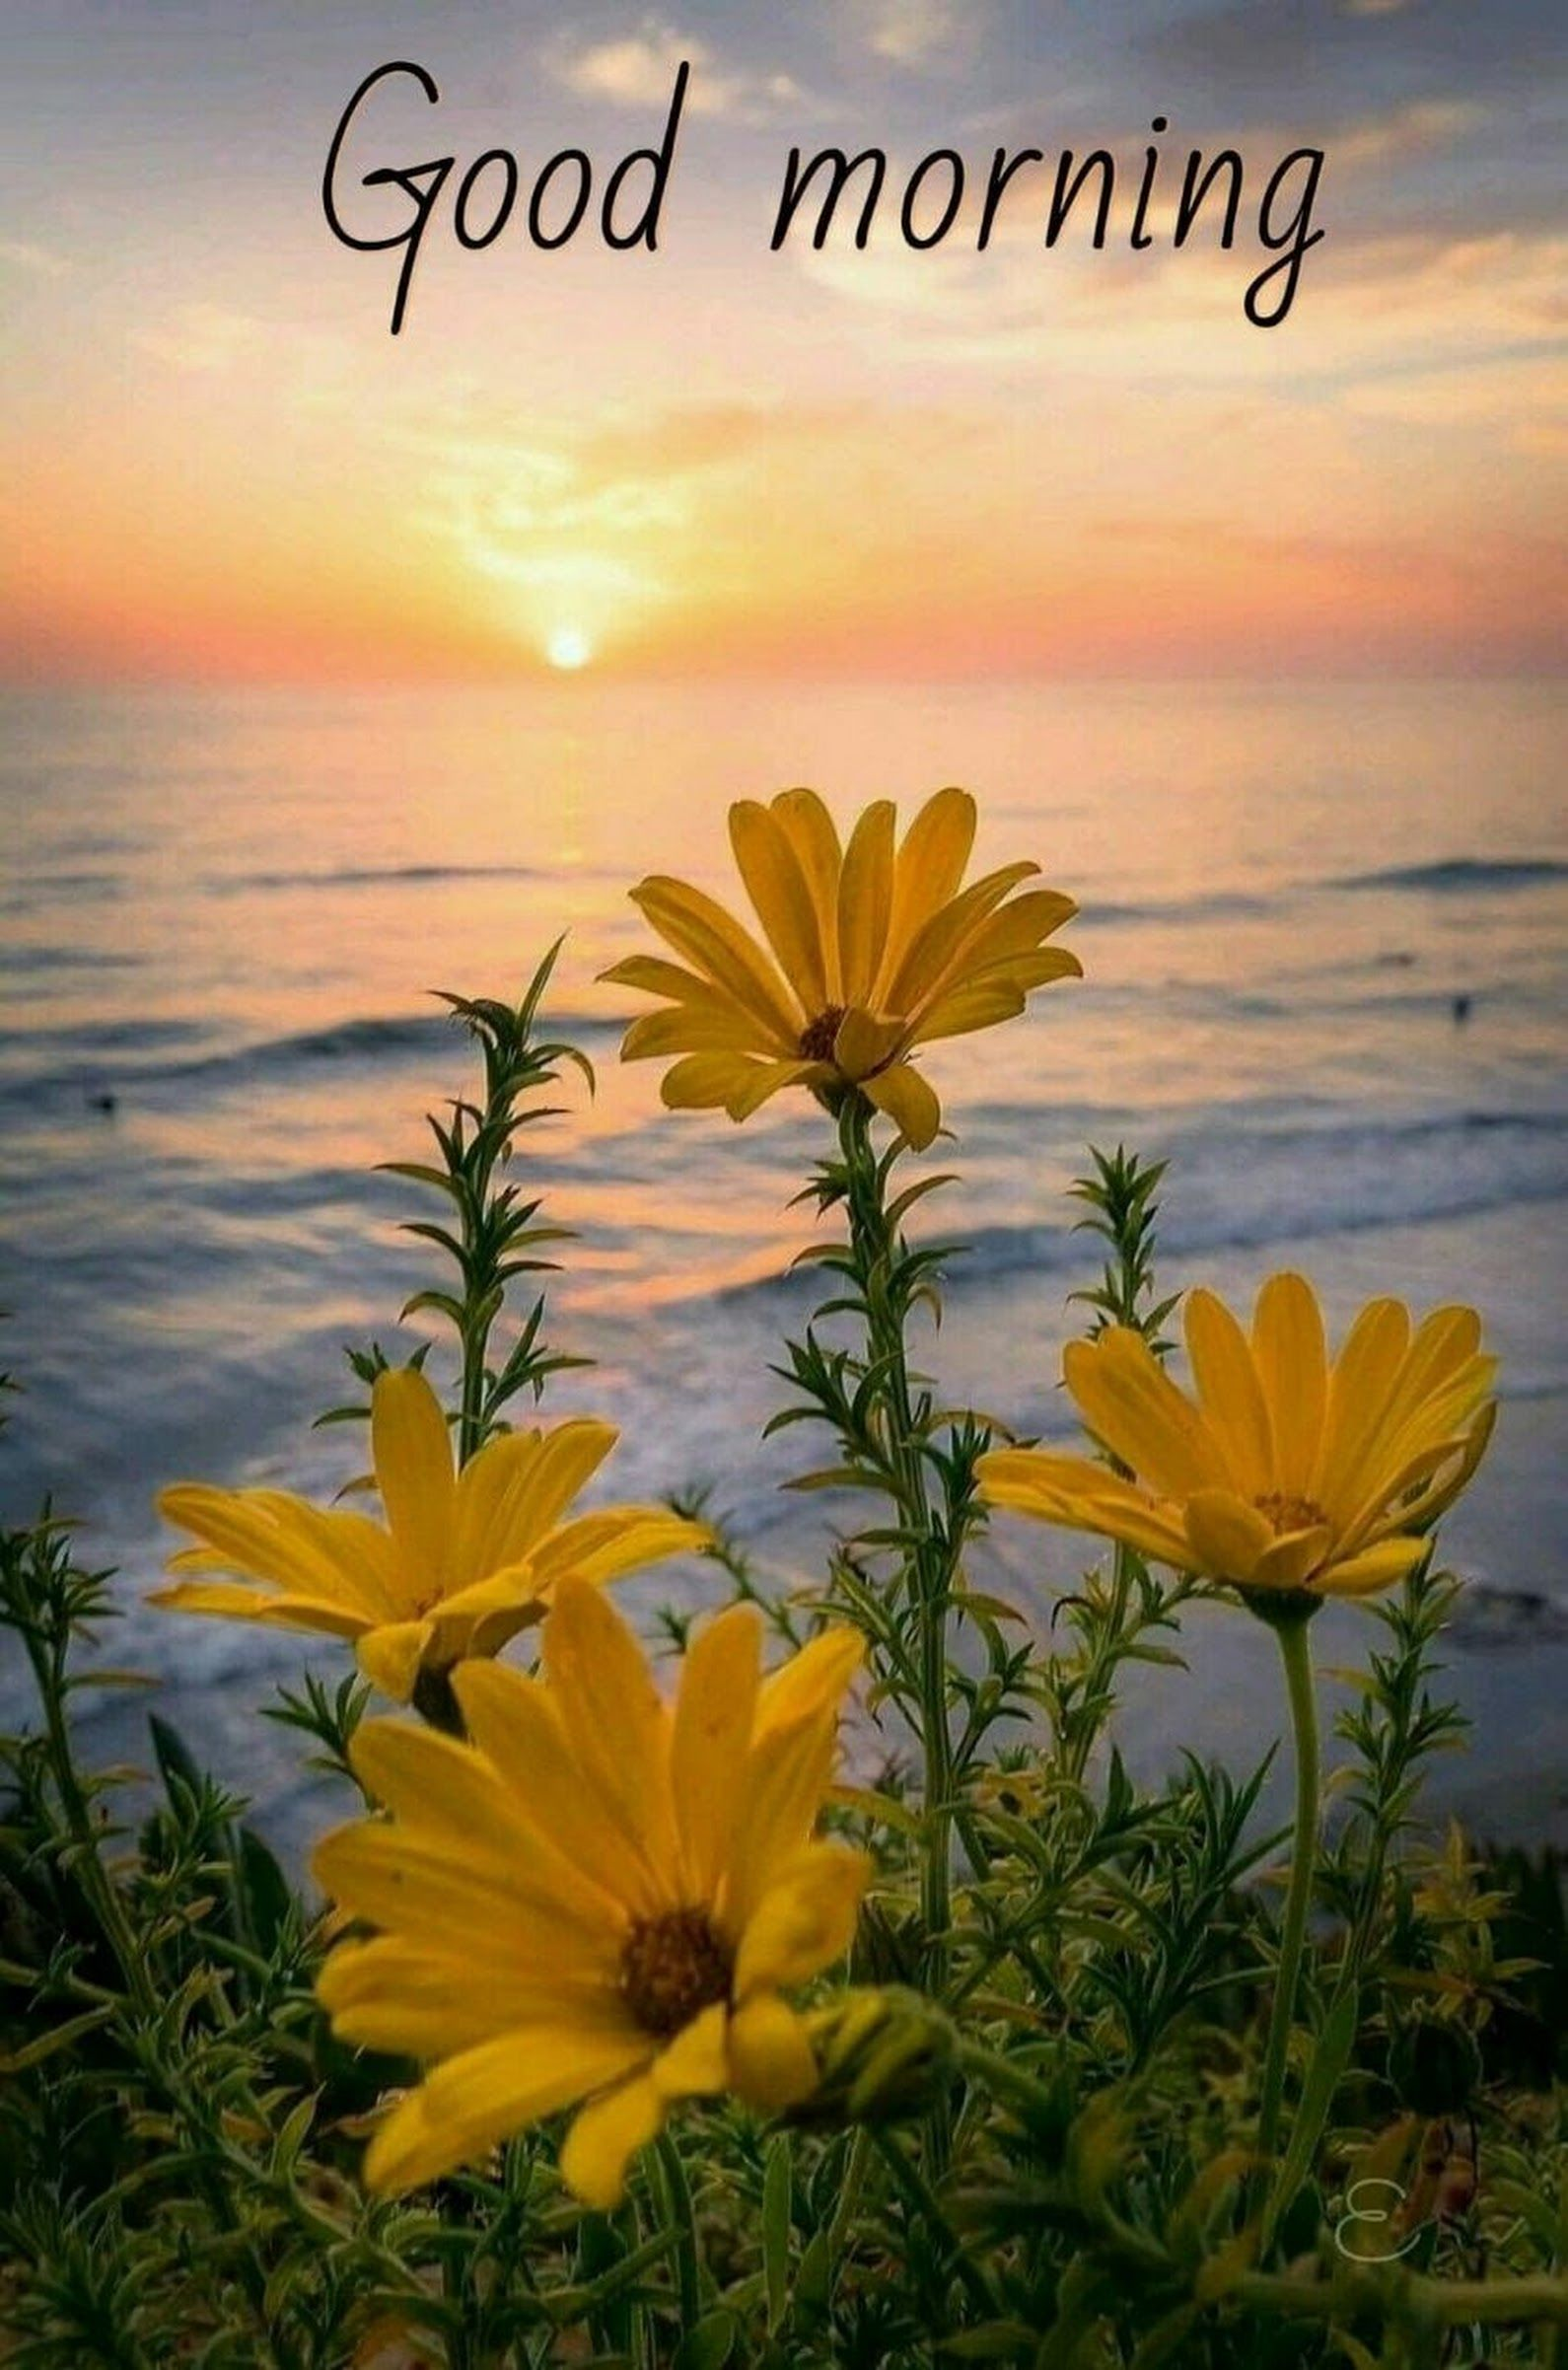 Good Morning Greetings Saudaes Pinterest Dil Se Night